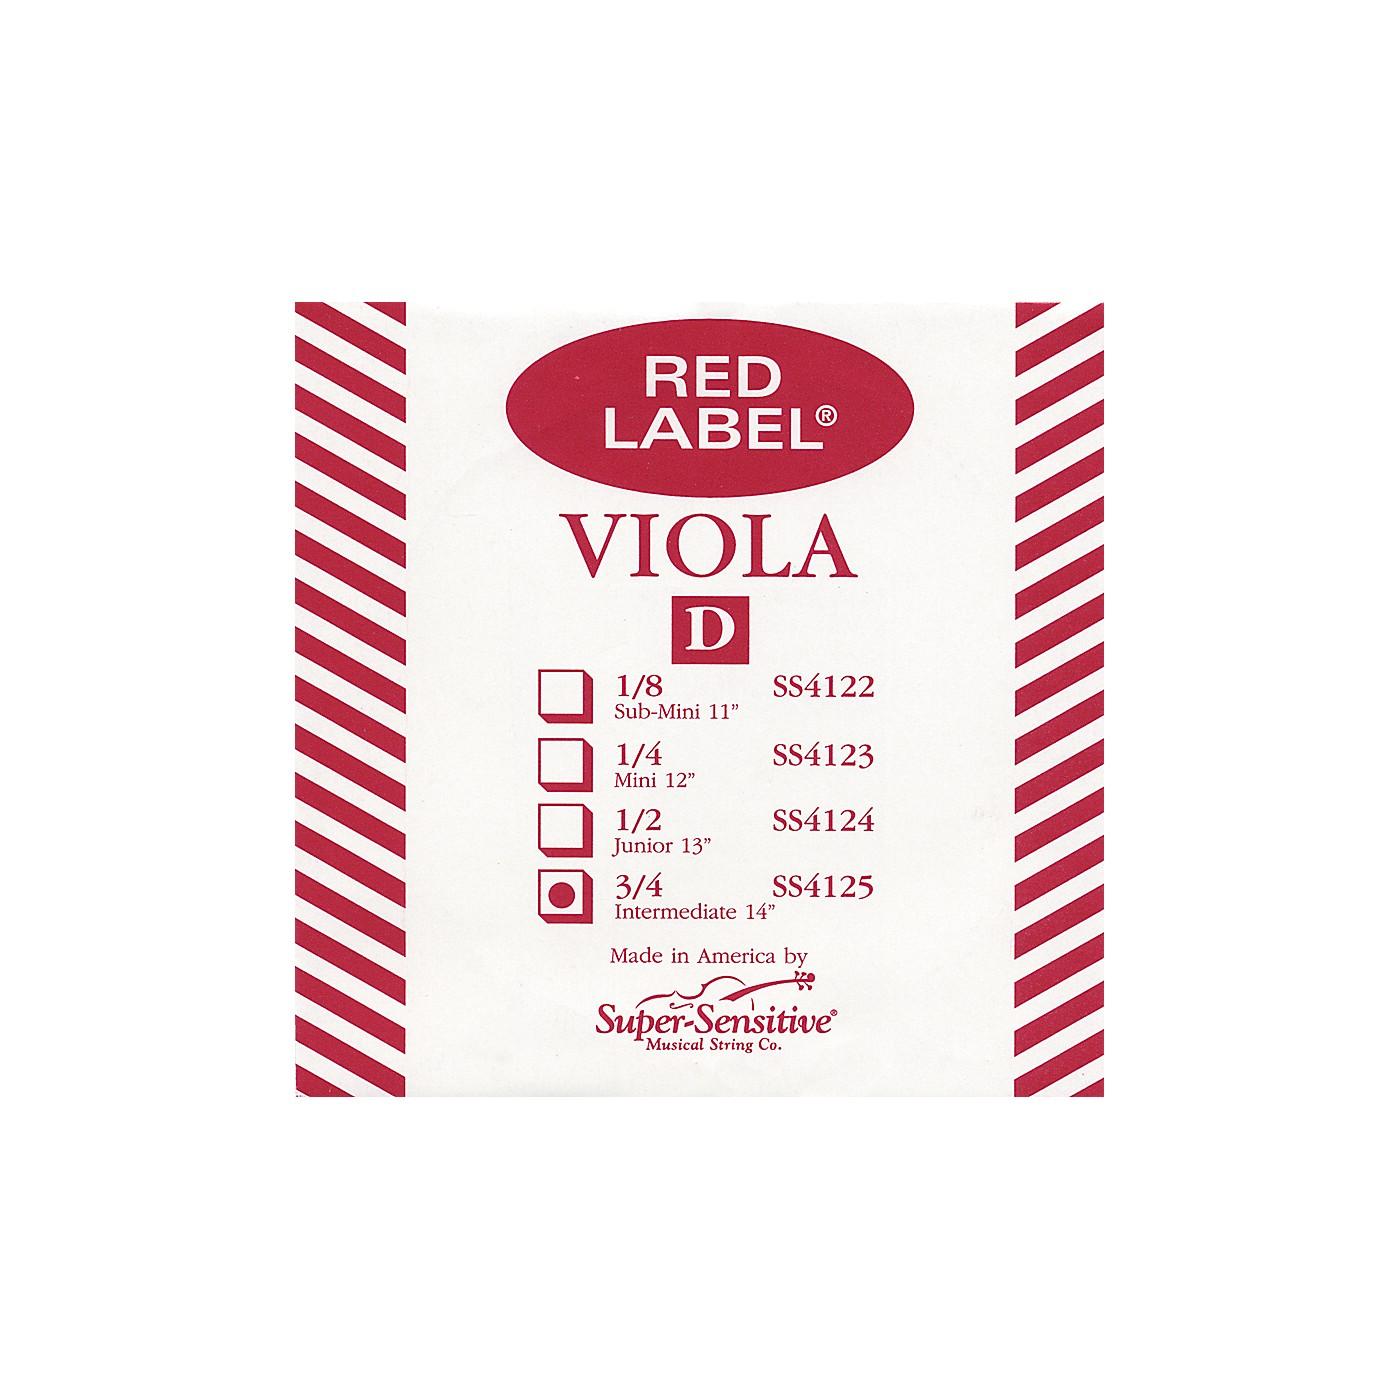 Super Sensitive Red Label Viola D String thumbnail